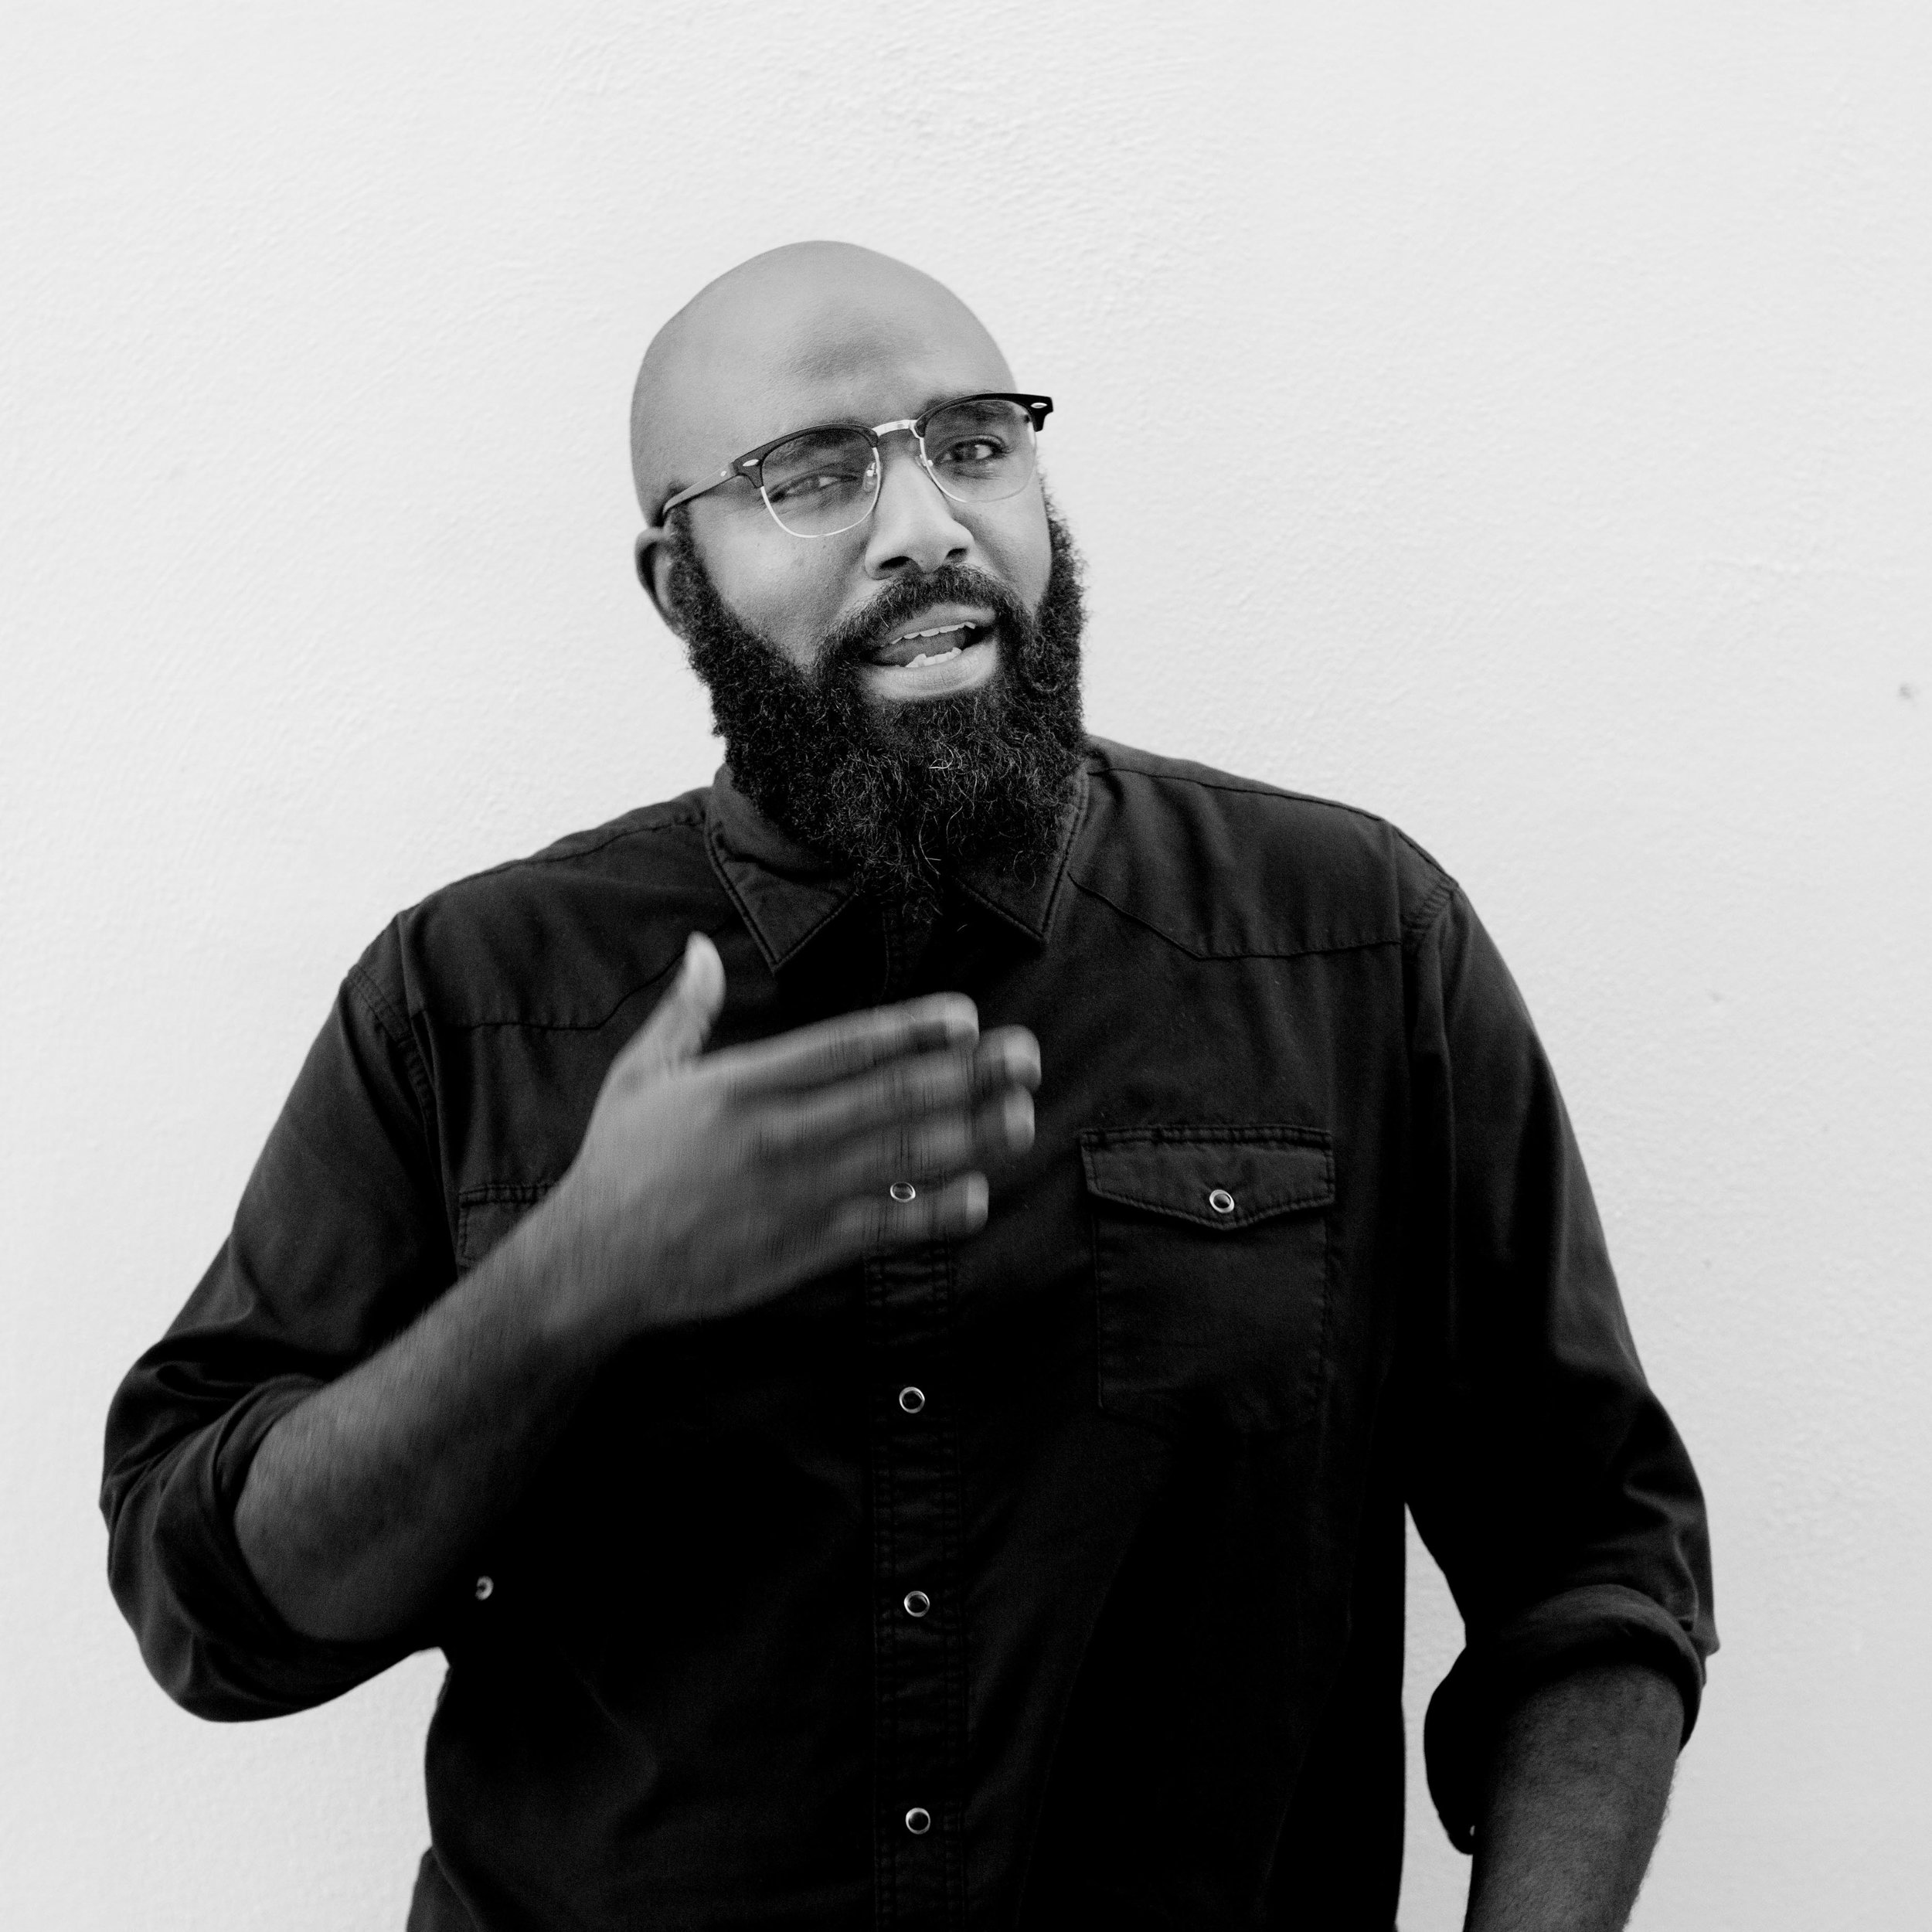 ADAM TILLMAN-YOUNG | Founder & Chief Creative Officer